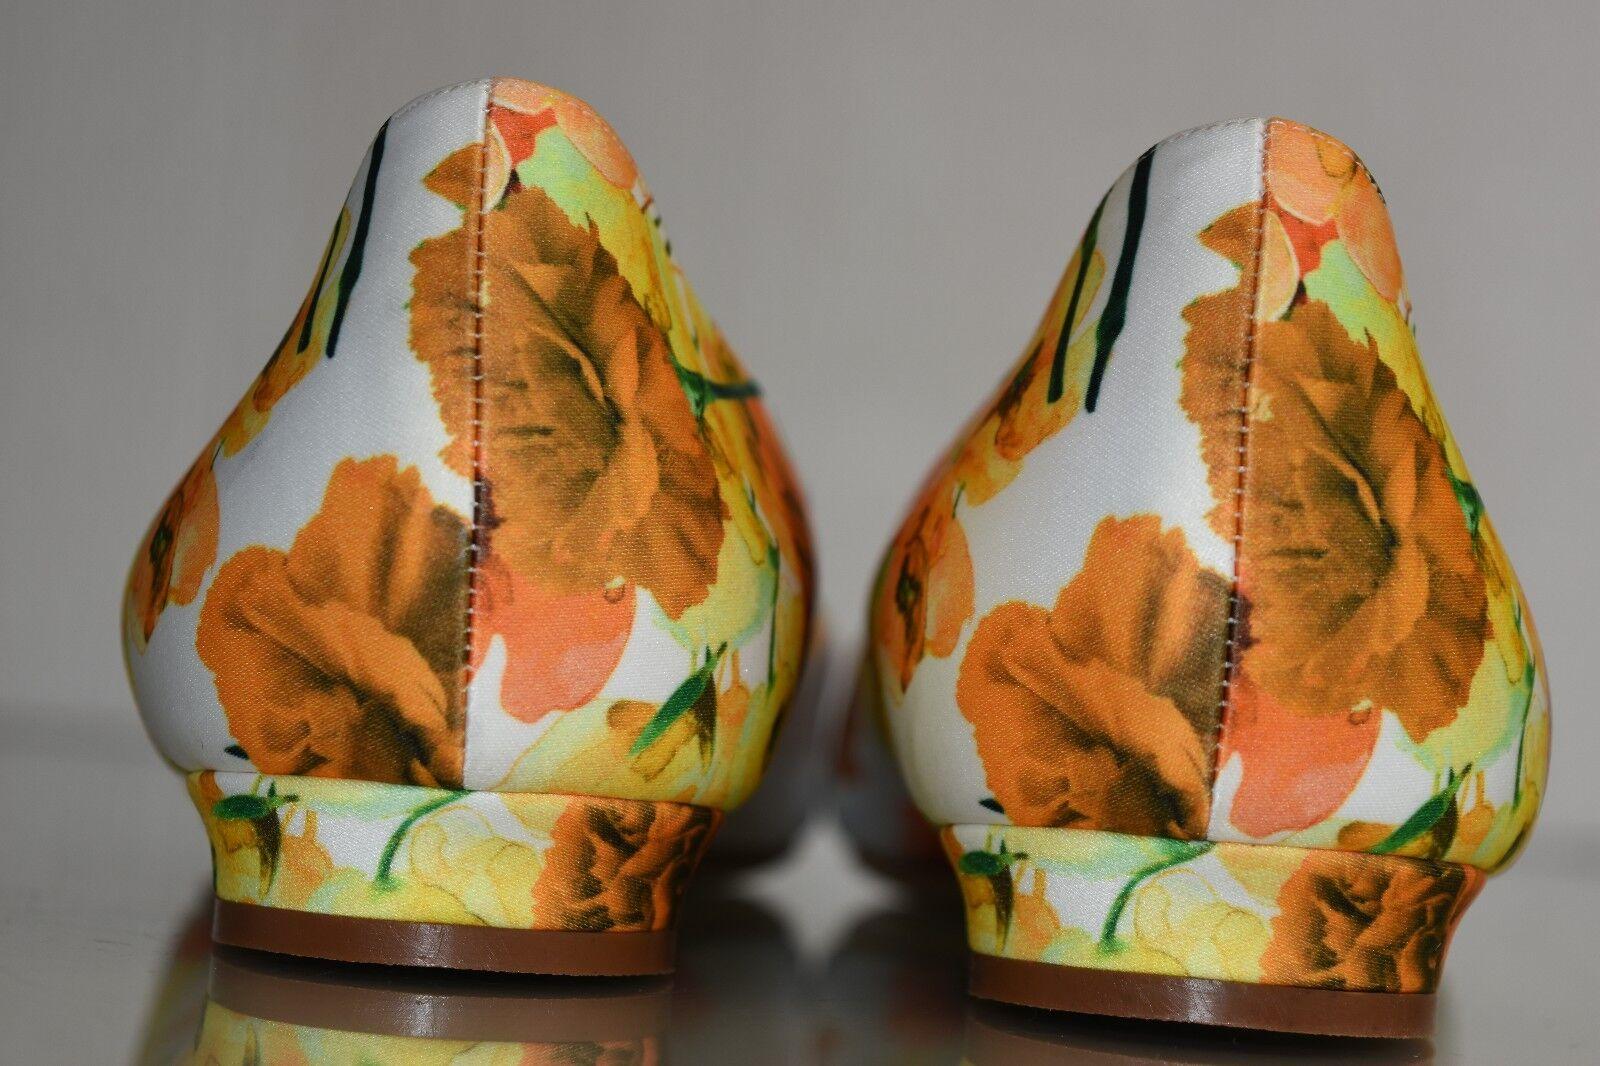 1065 NEW NEW NEW MANOLO BLAHNIK HANGISI Floral Satin JEWELED orange Flats SHOES 41.5 42 8179f6